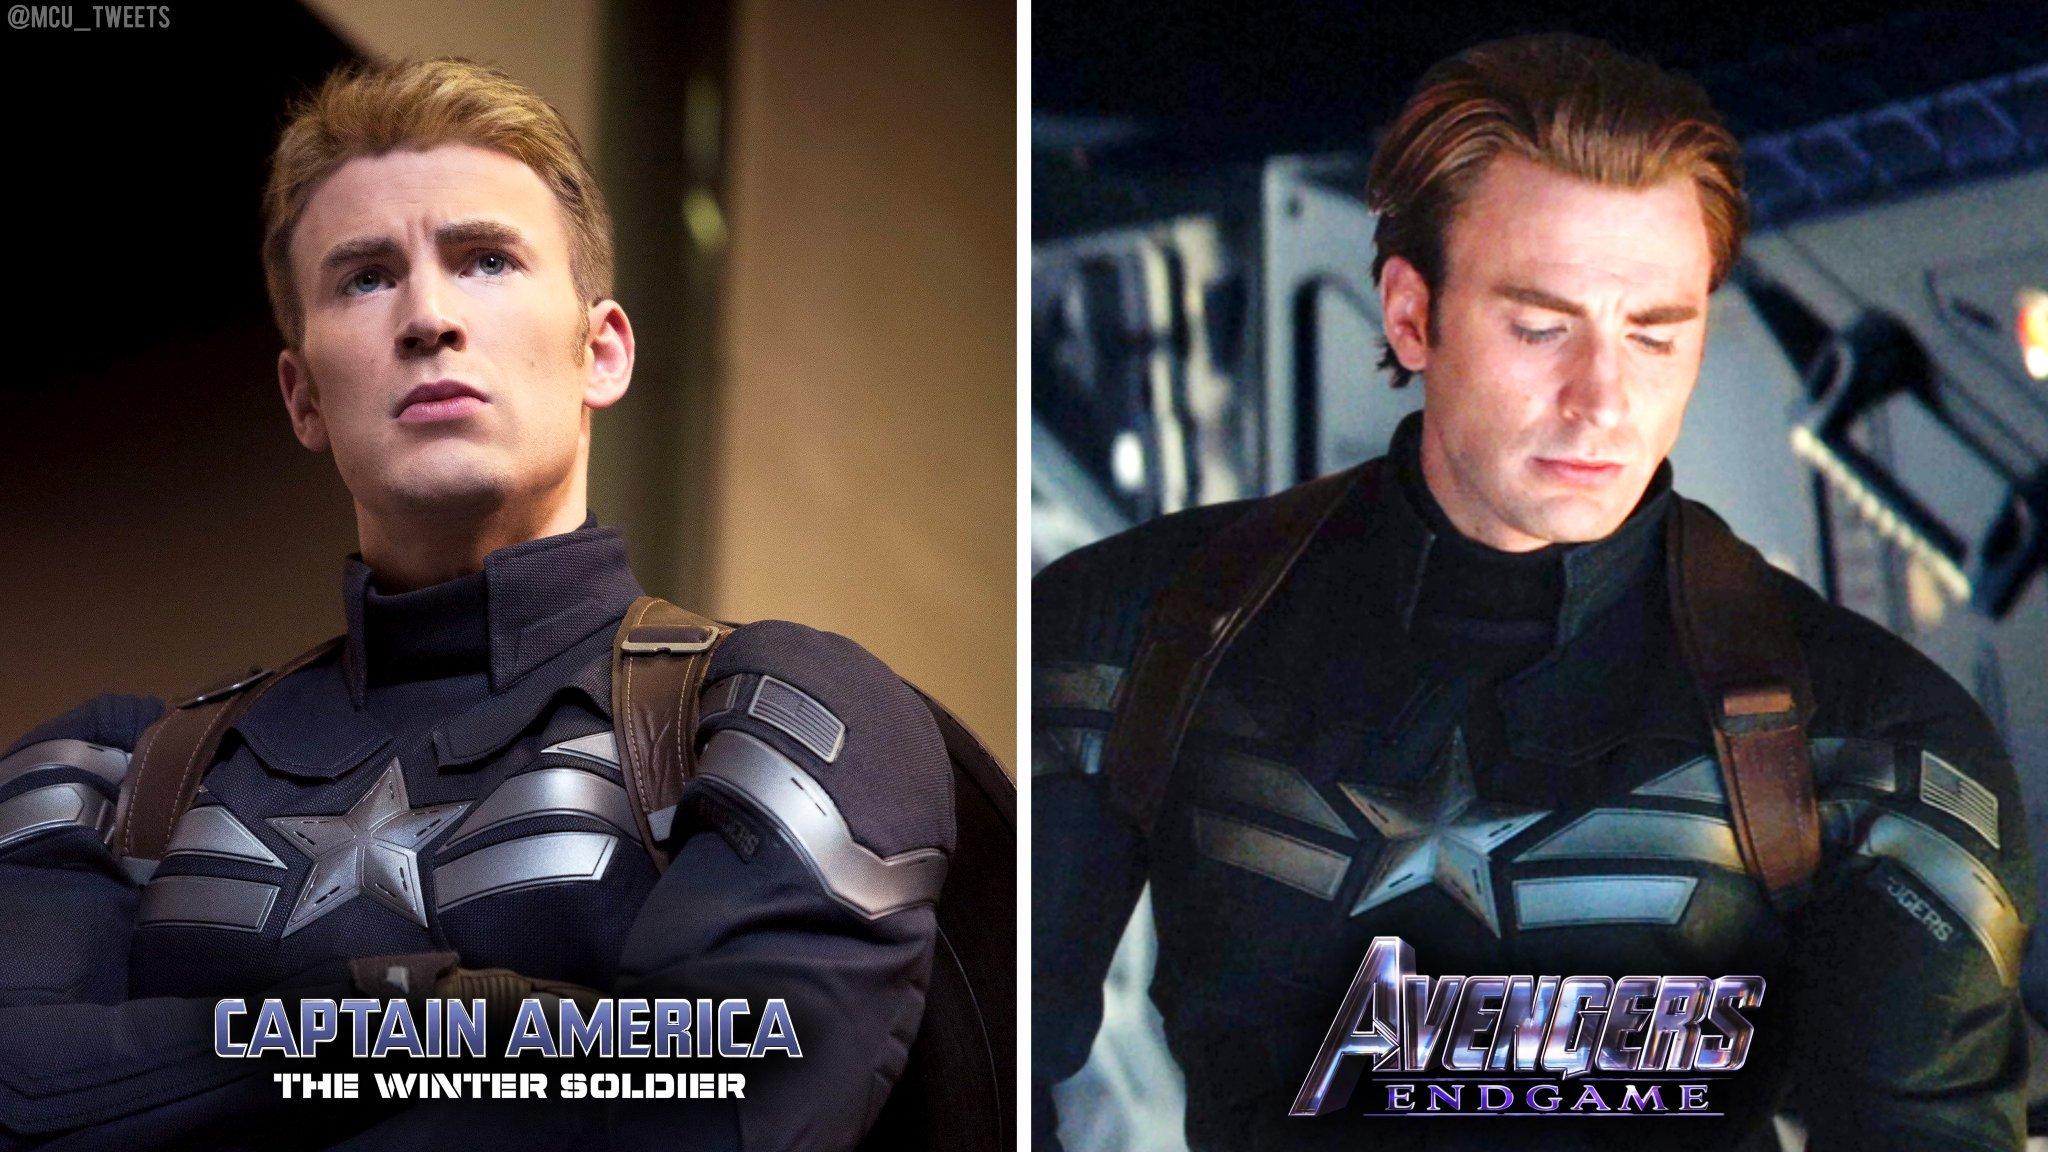 Мстители: Финал - Костюм Капитана Америка